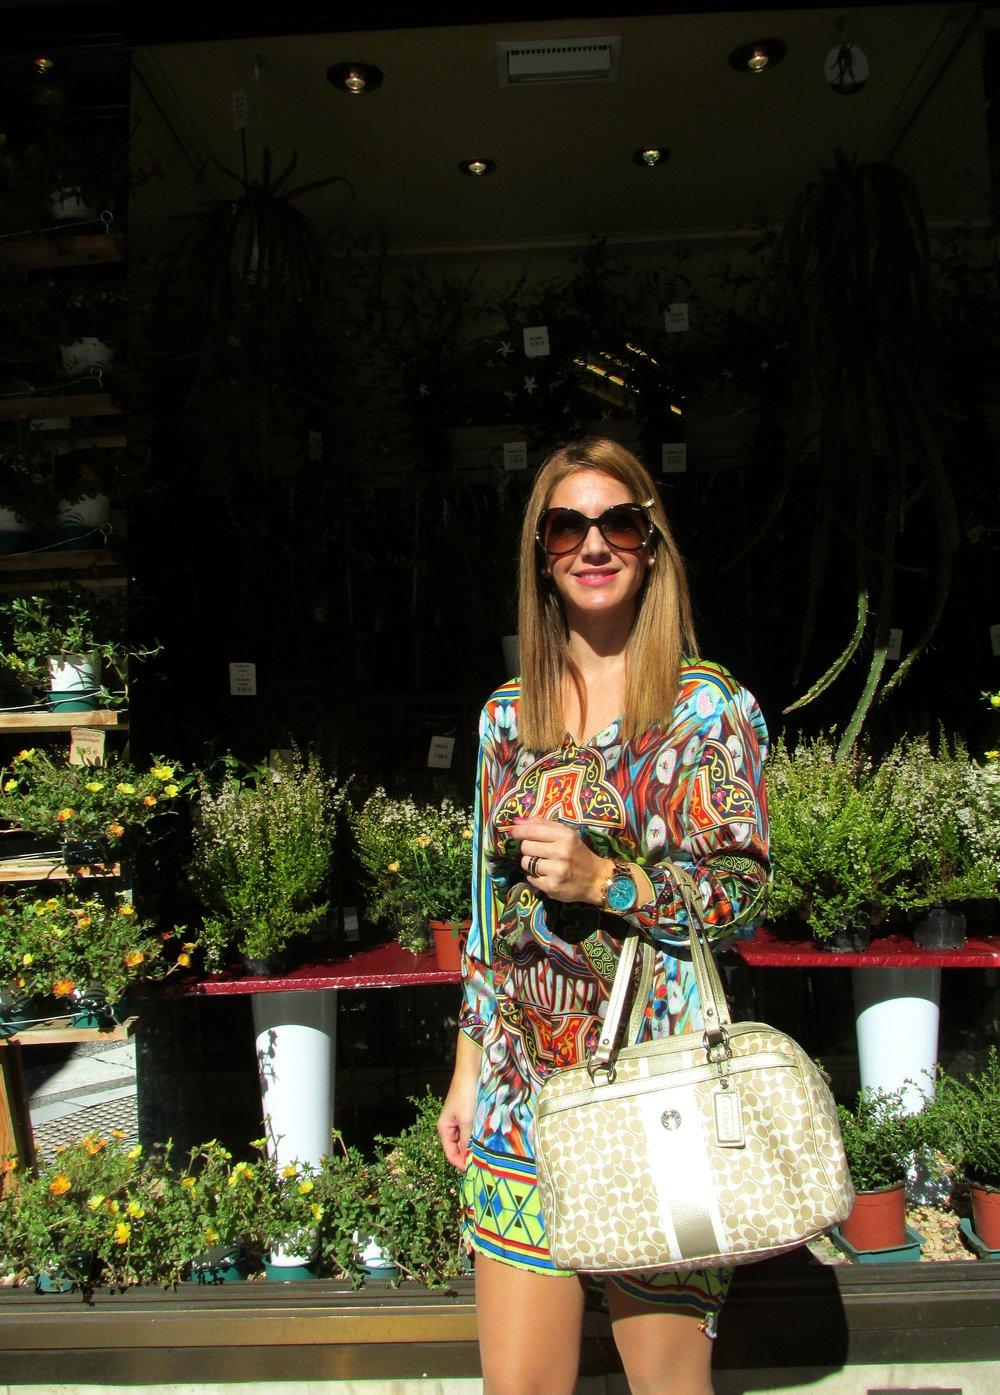 Colouful dress fashion blog 3